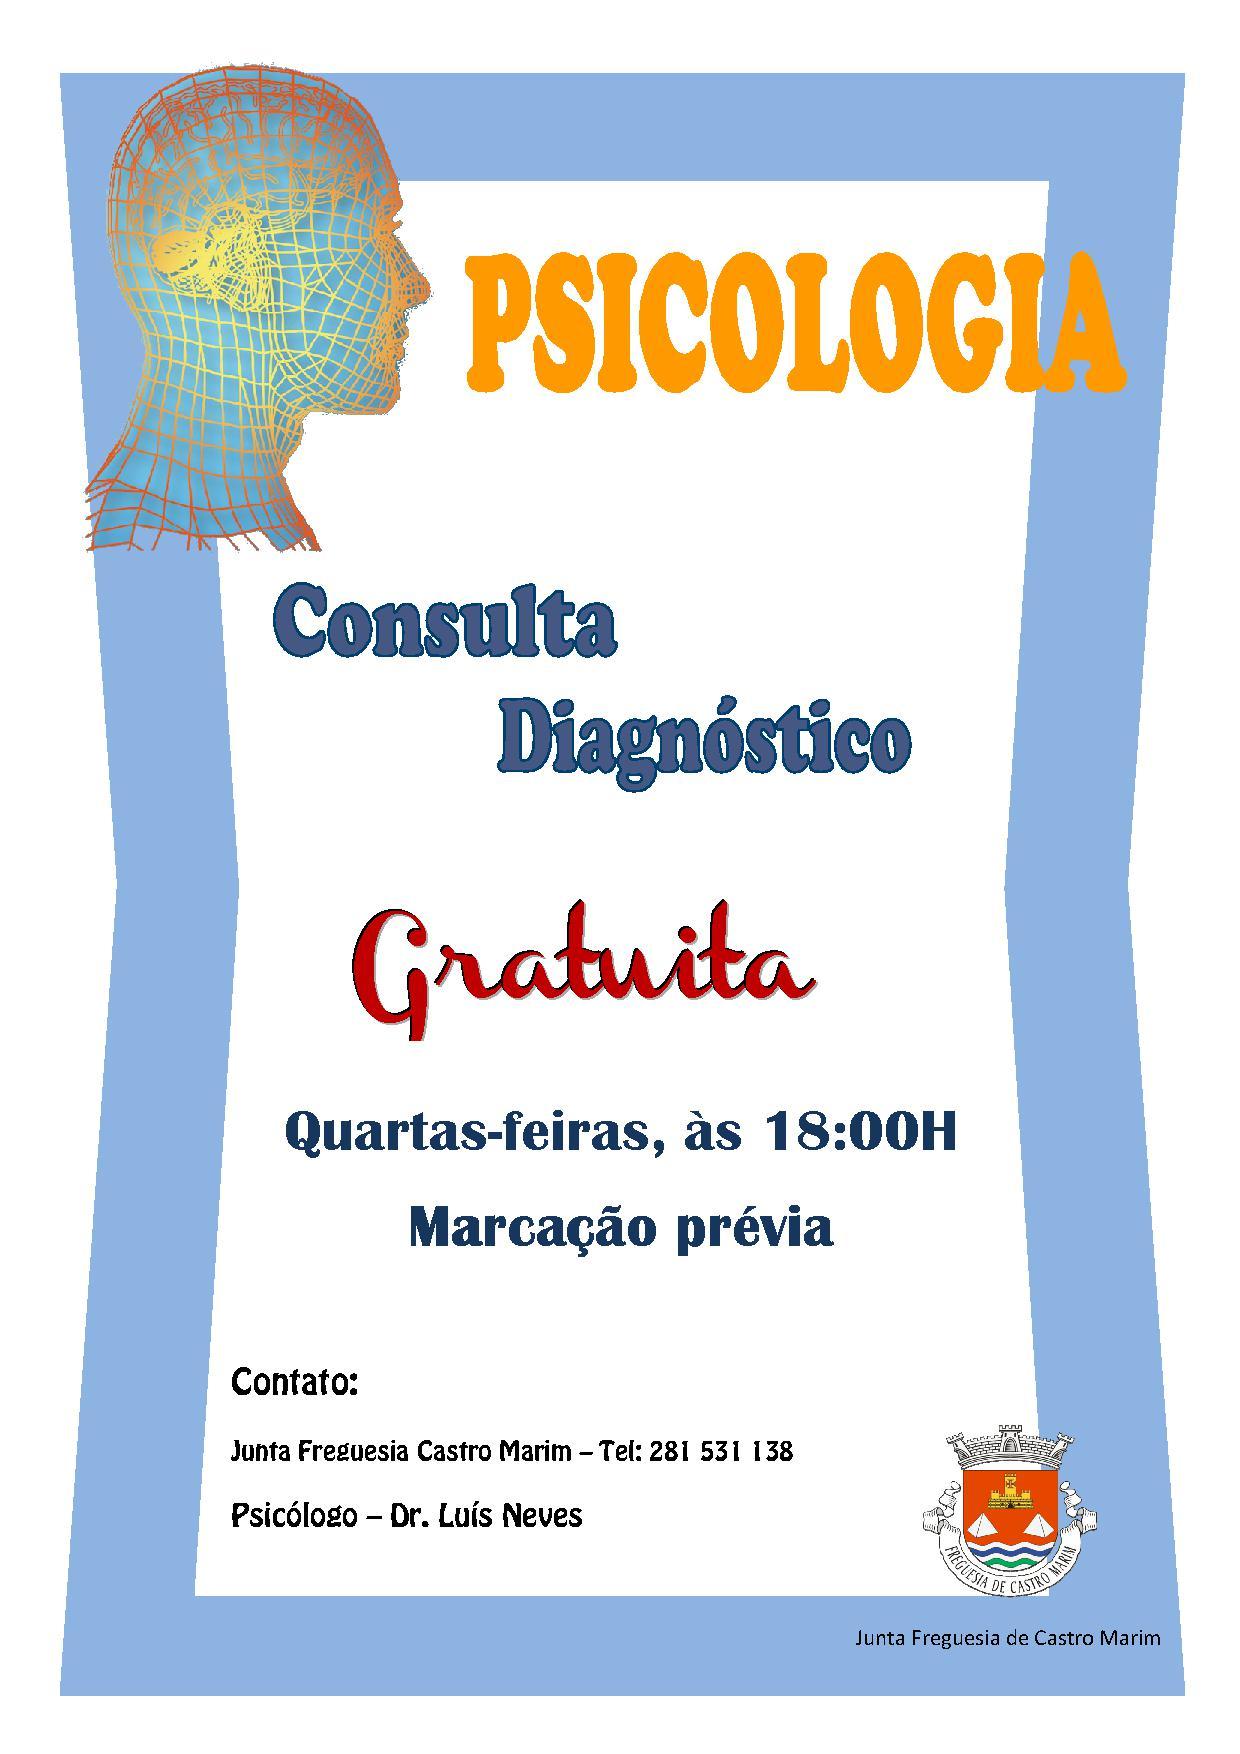 Psicologia_Cartaz